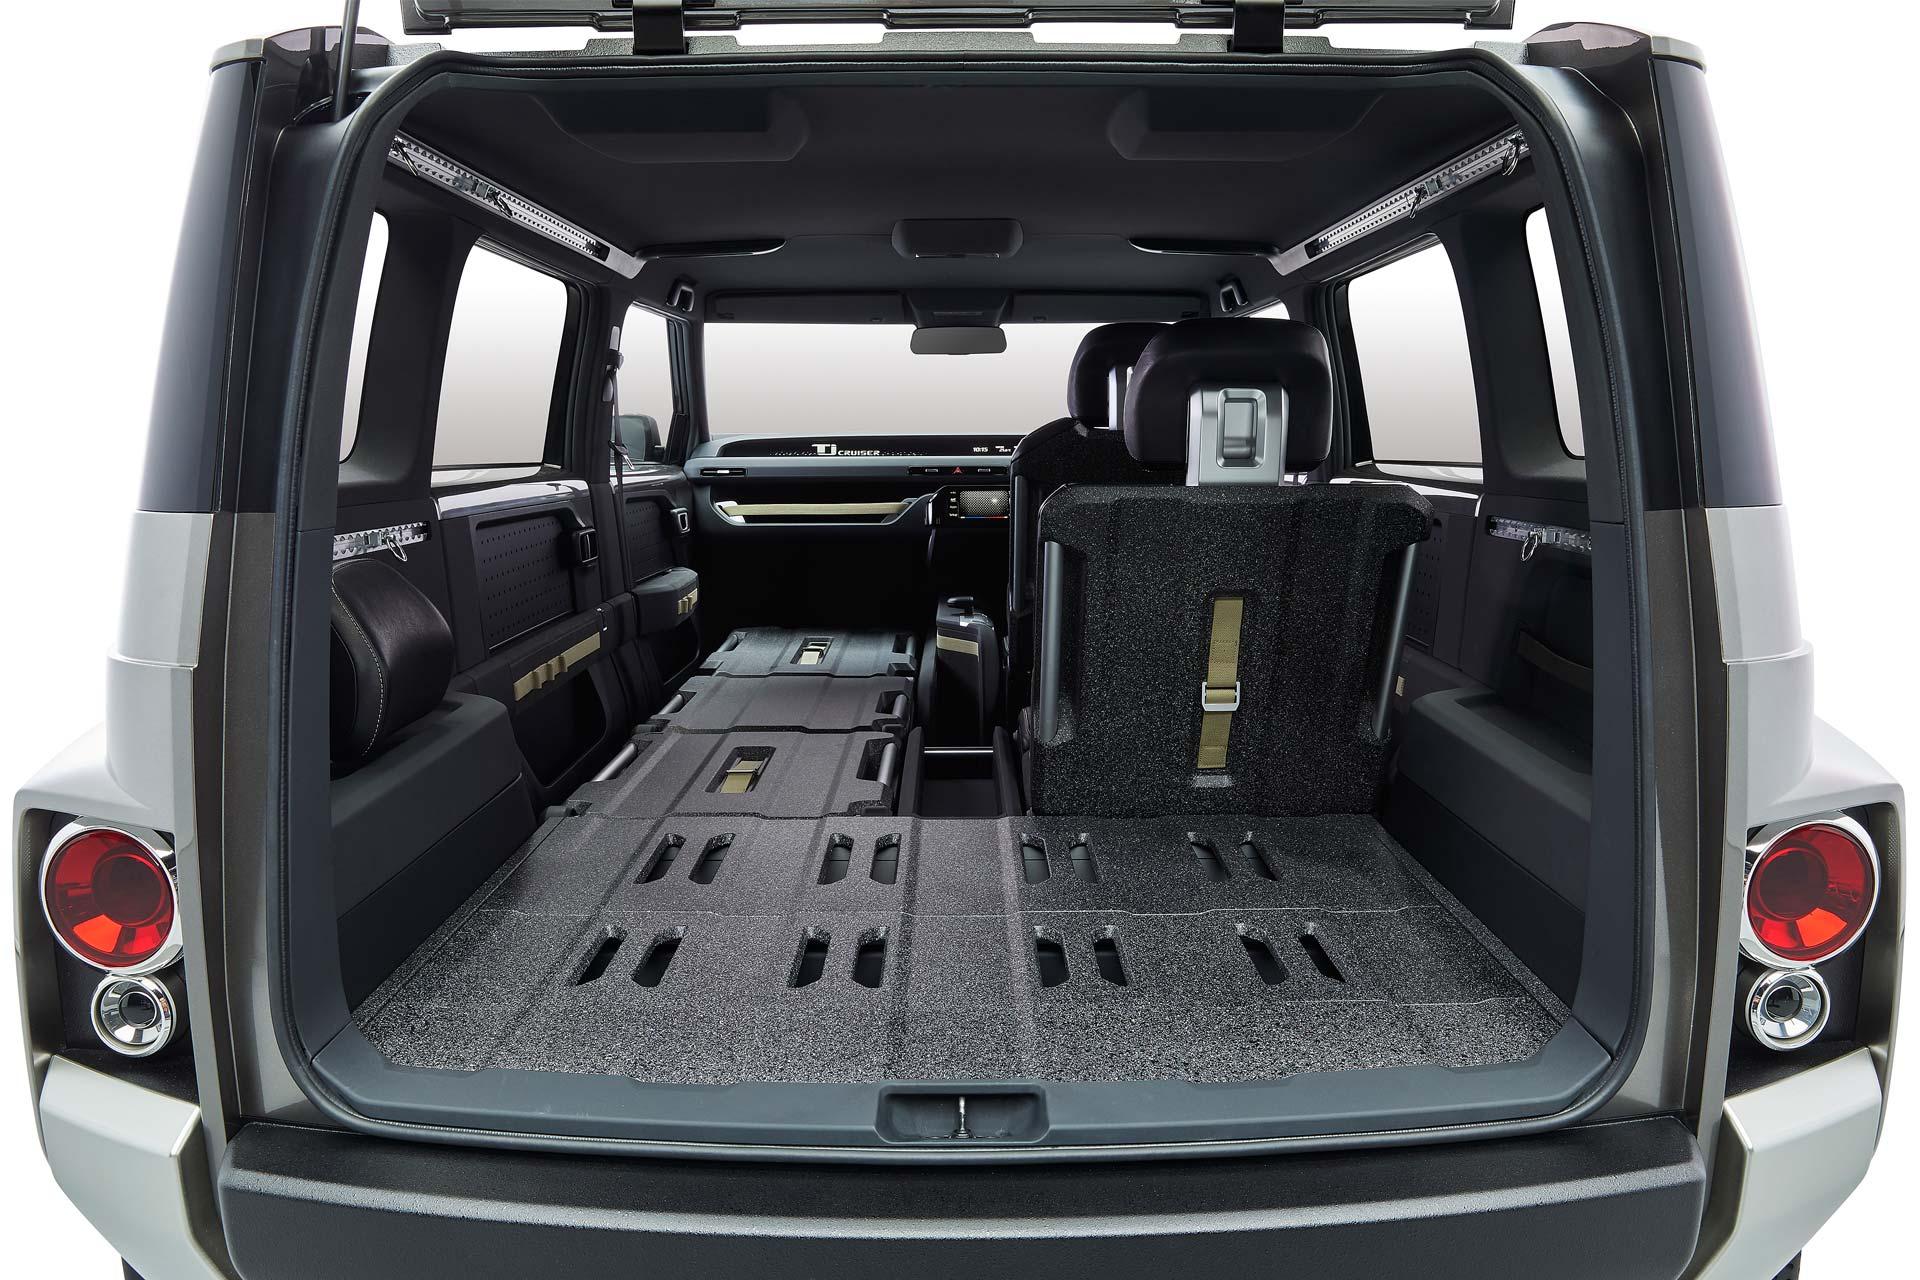 Toyota-TJ-Cruiser-concept-interior_3